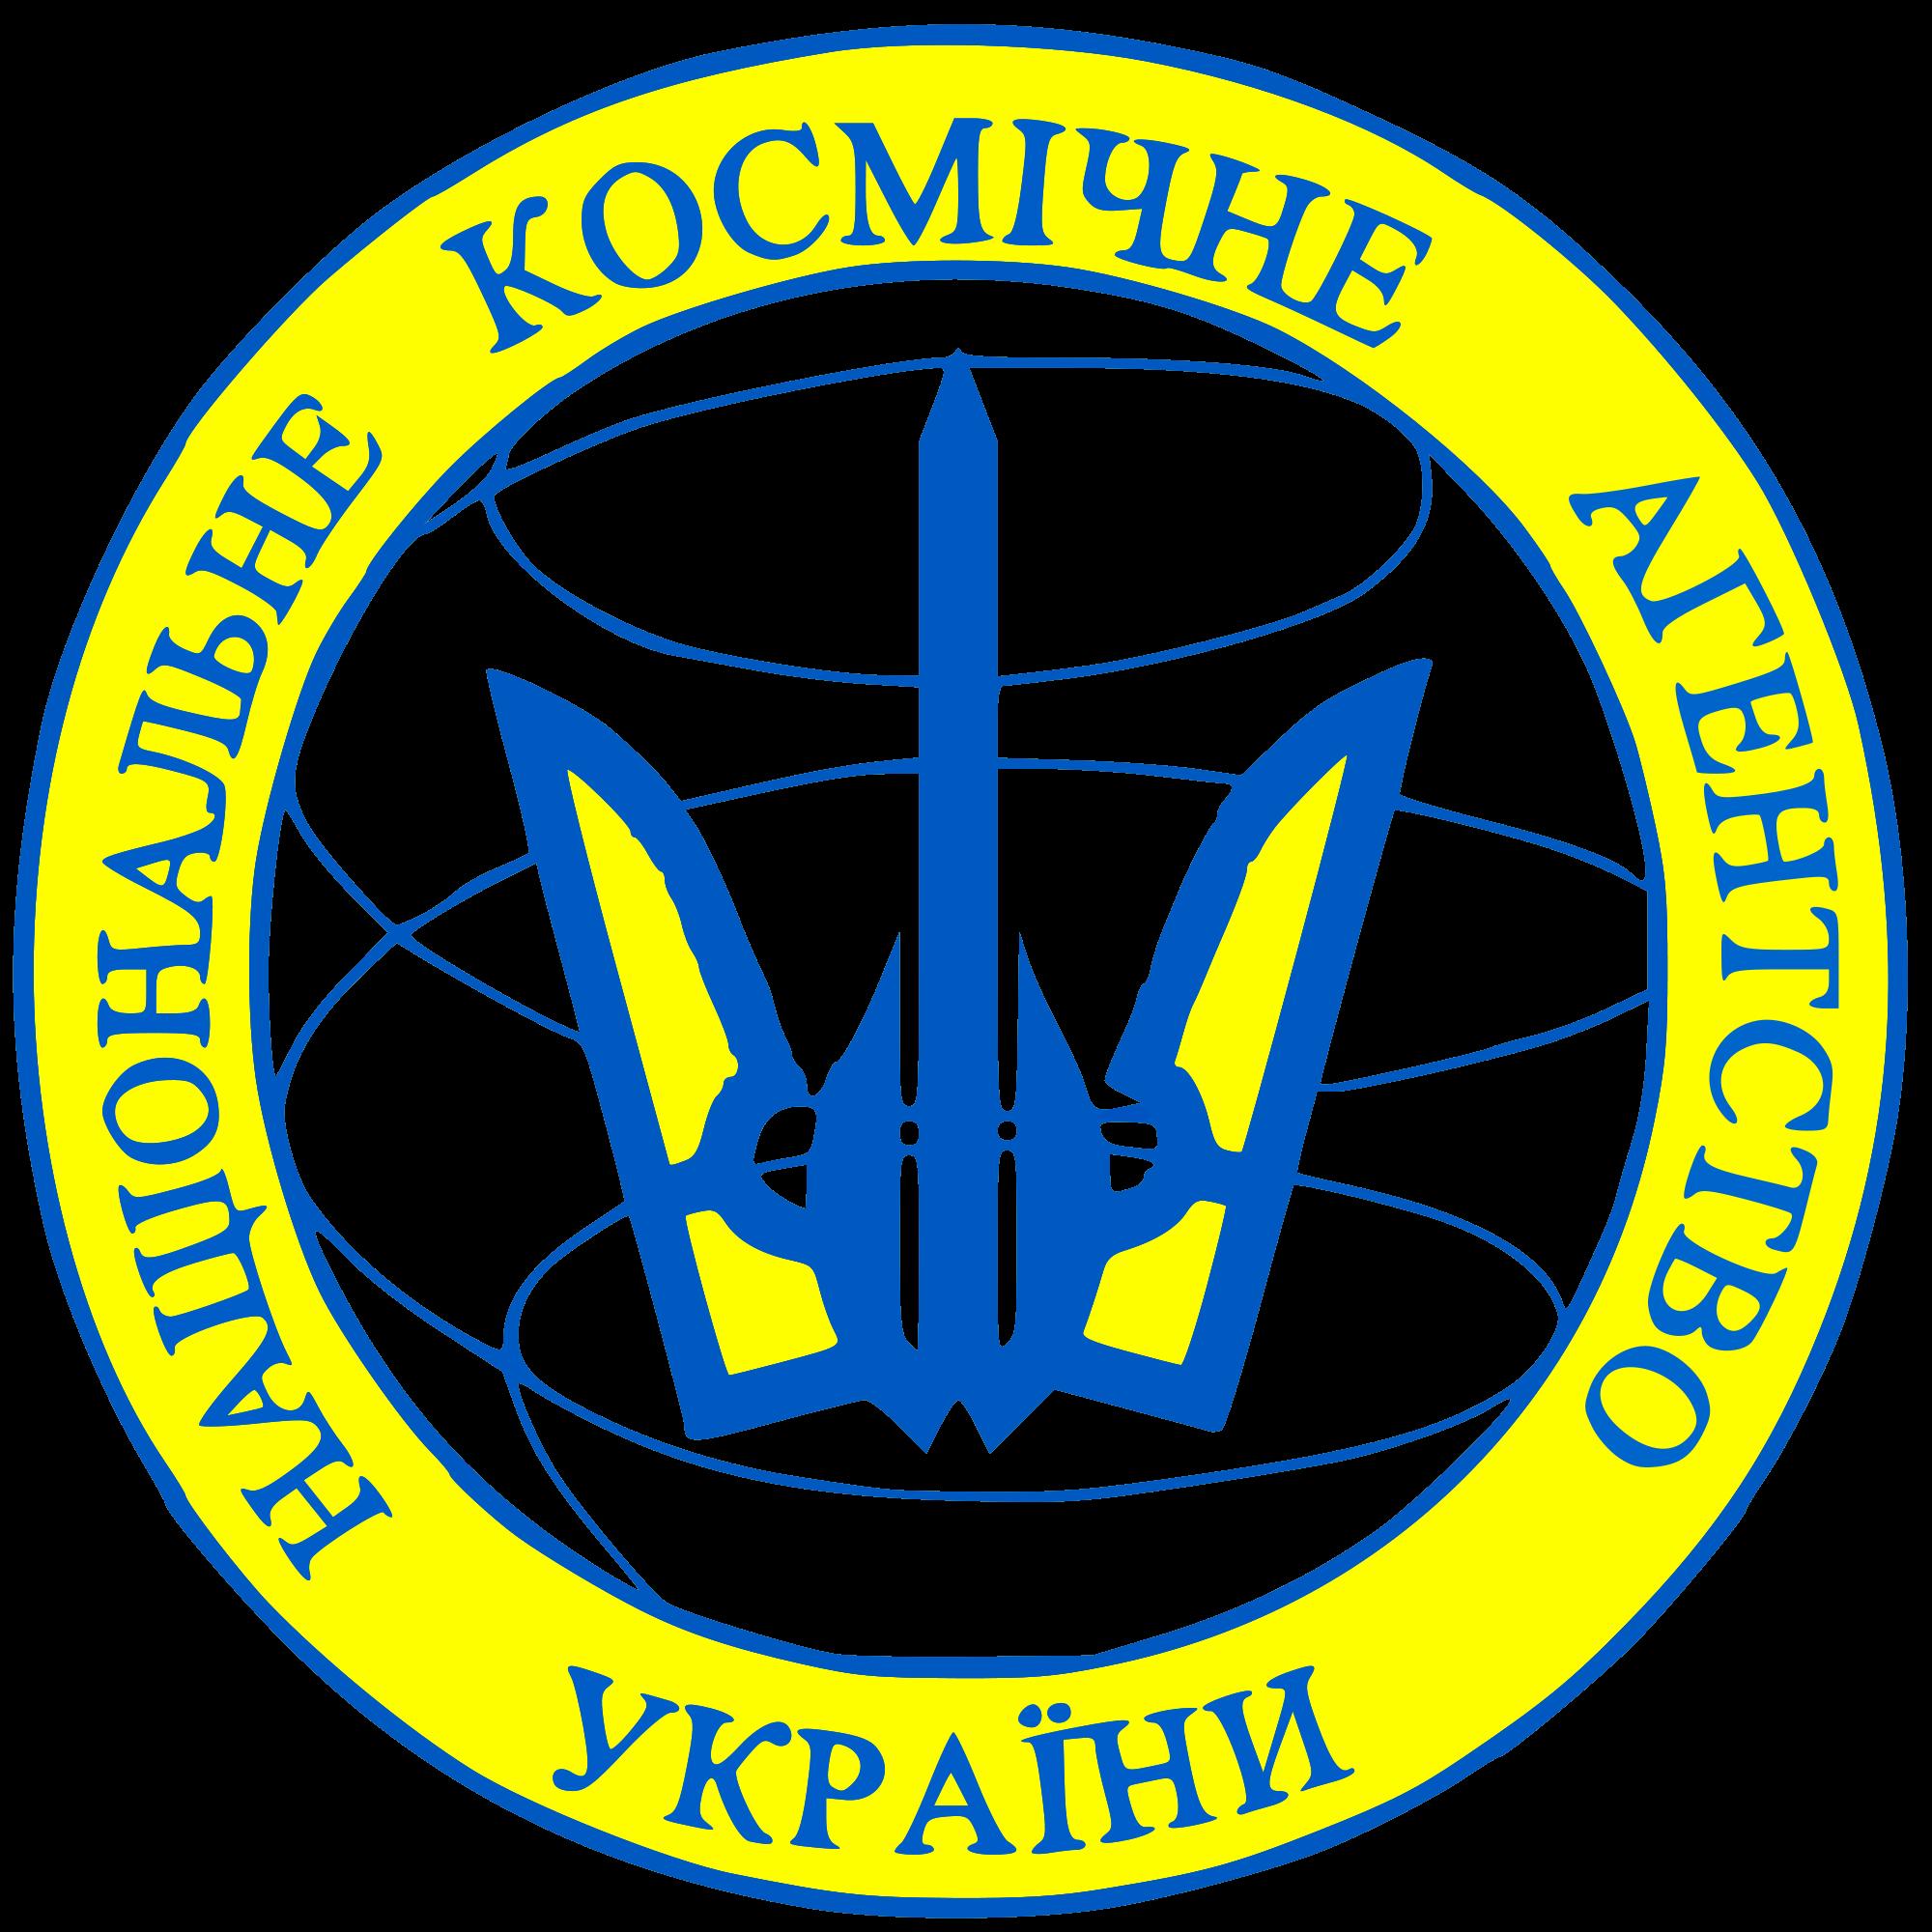 Державне космічне агентство України